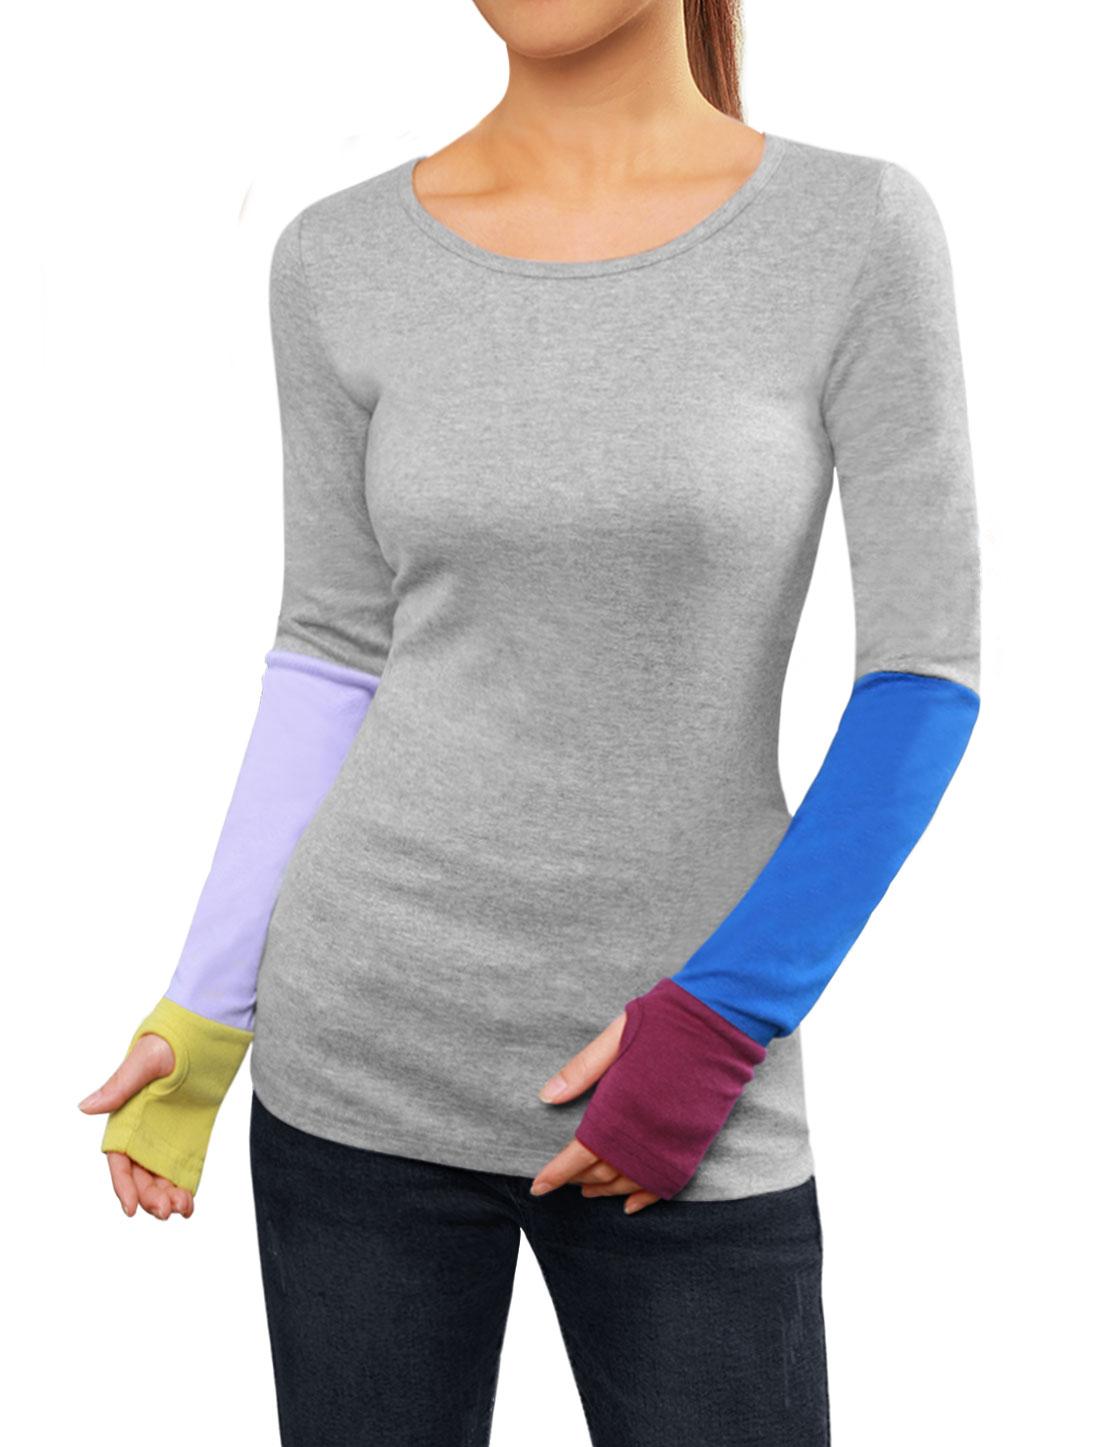 Woman Color Block Long Sleeves T-Shirt w Thumb Hole Gray XS